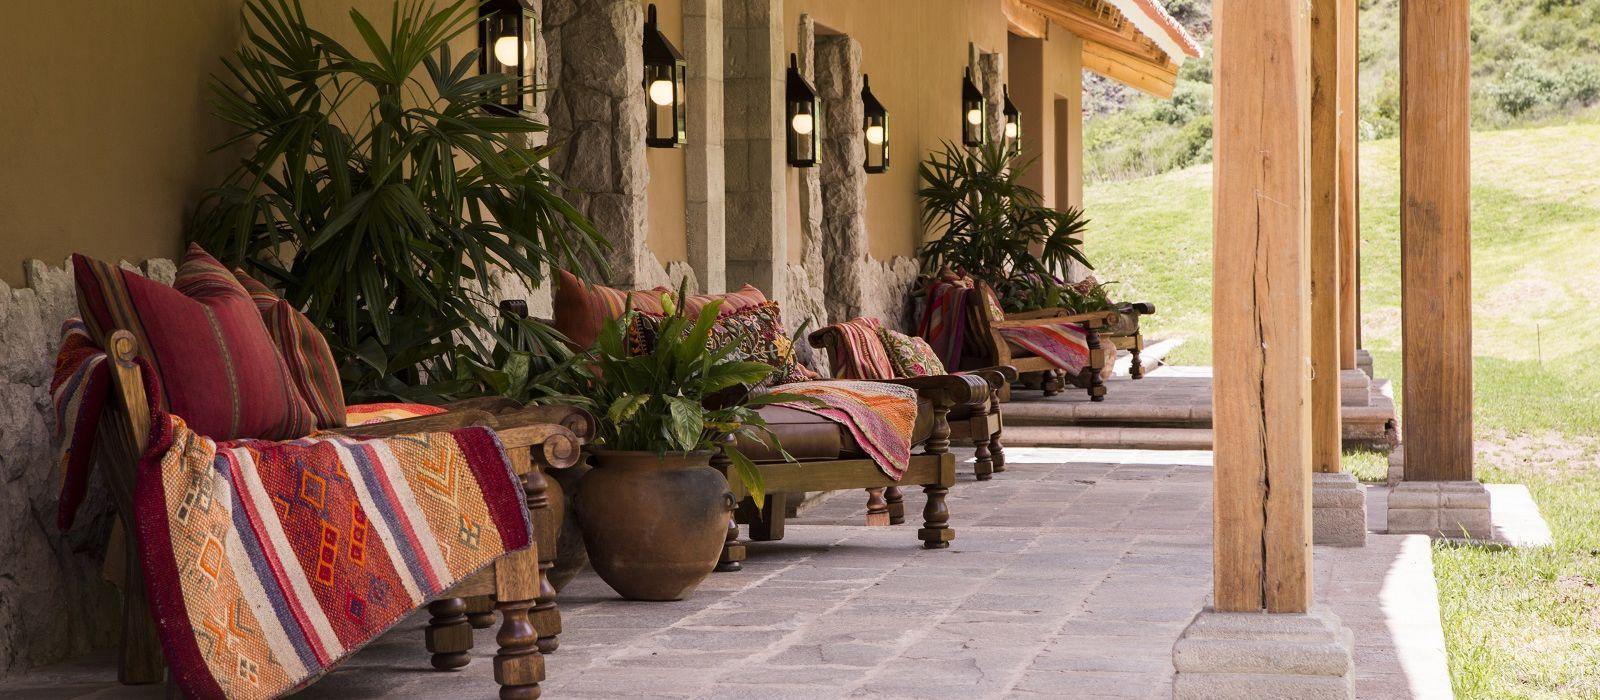 Hotel Inkaterra Hacienda Urubamba Peru